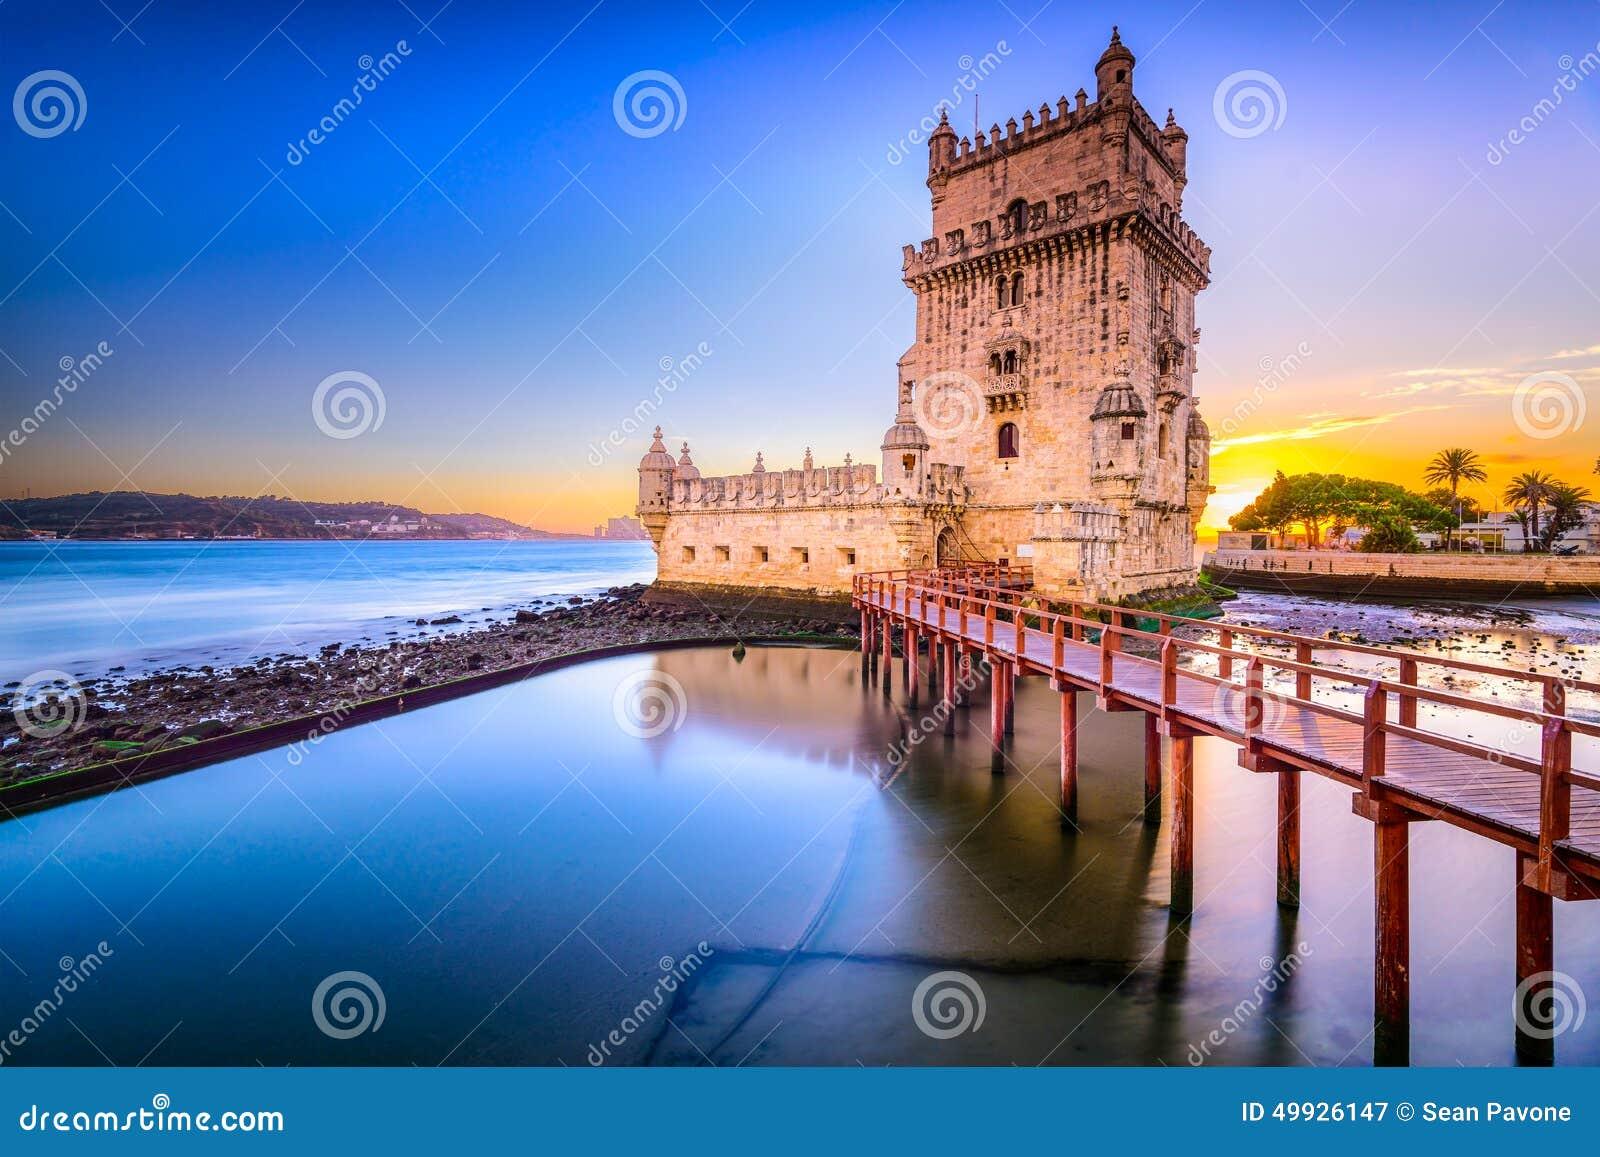 Torre de Belem en Portugal